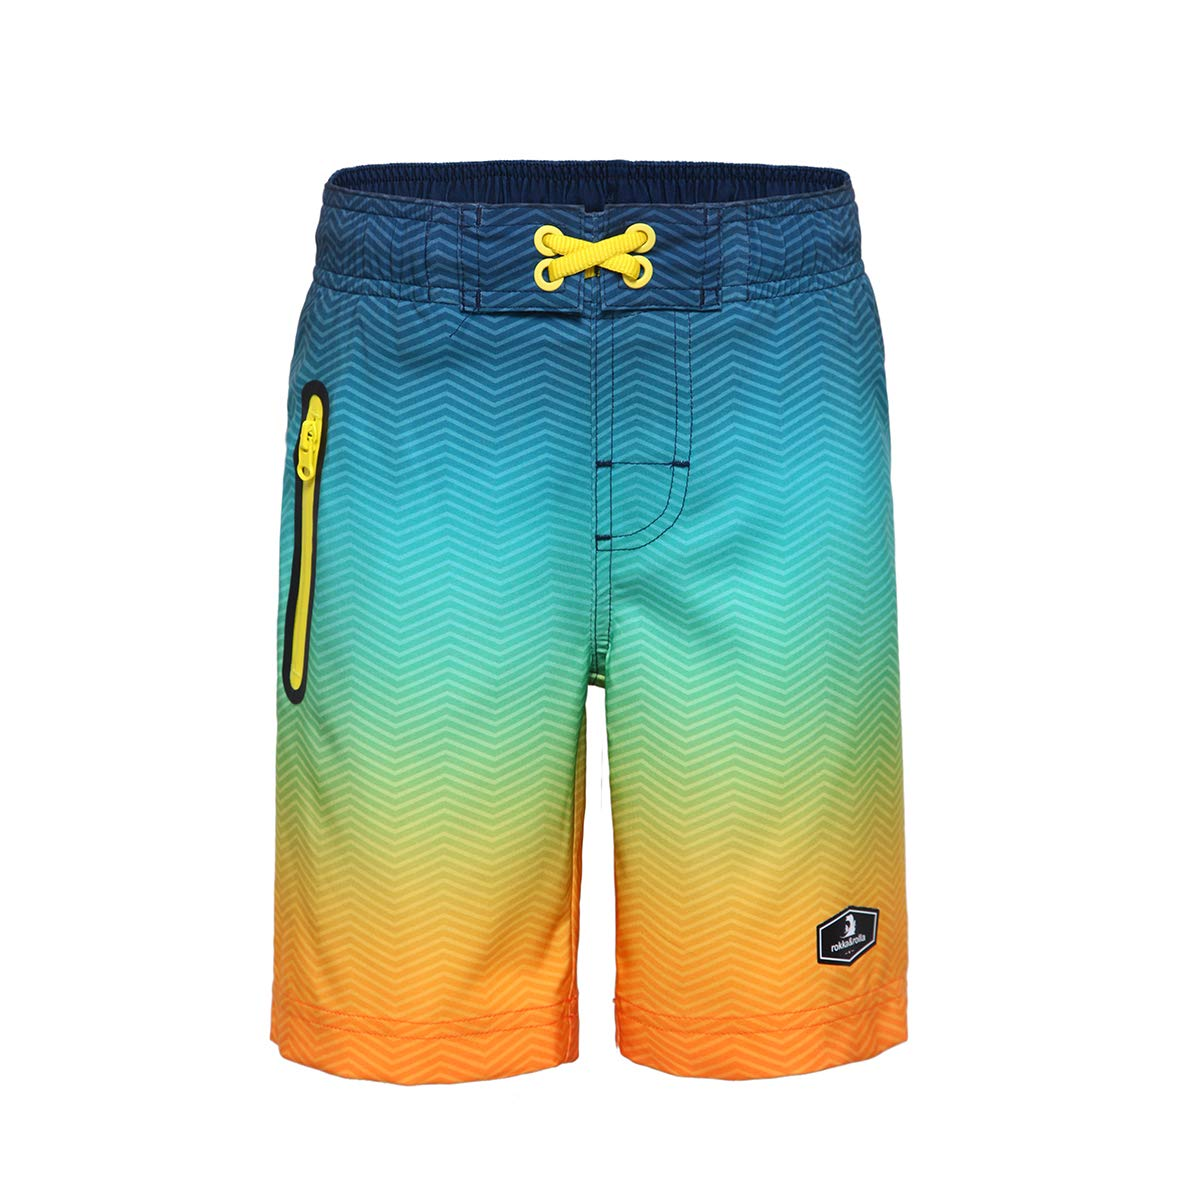 Rokka&Rolla Boys' Quick Dry Swim Trunks 4-Way Stretch Performance Beach Surfing Board Shorts with Mesh Lining